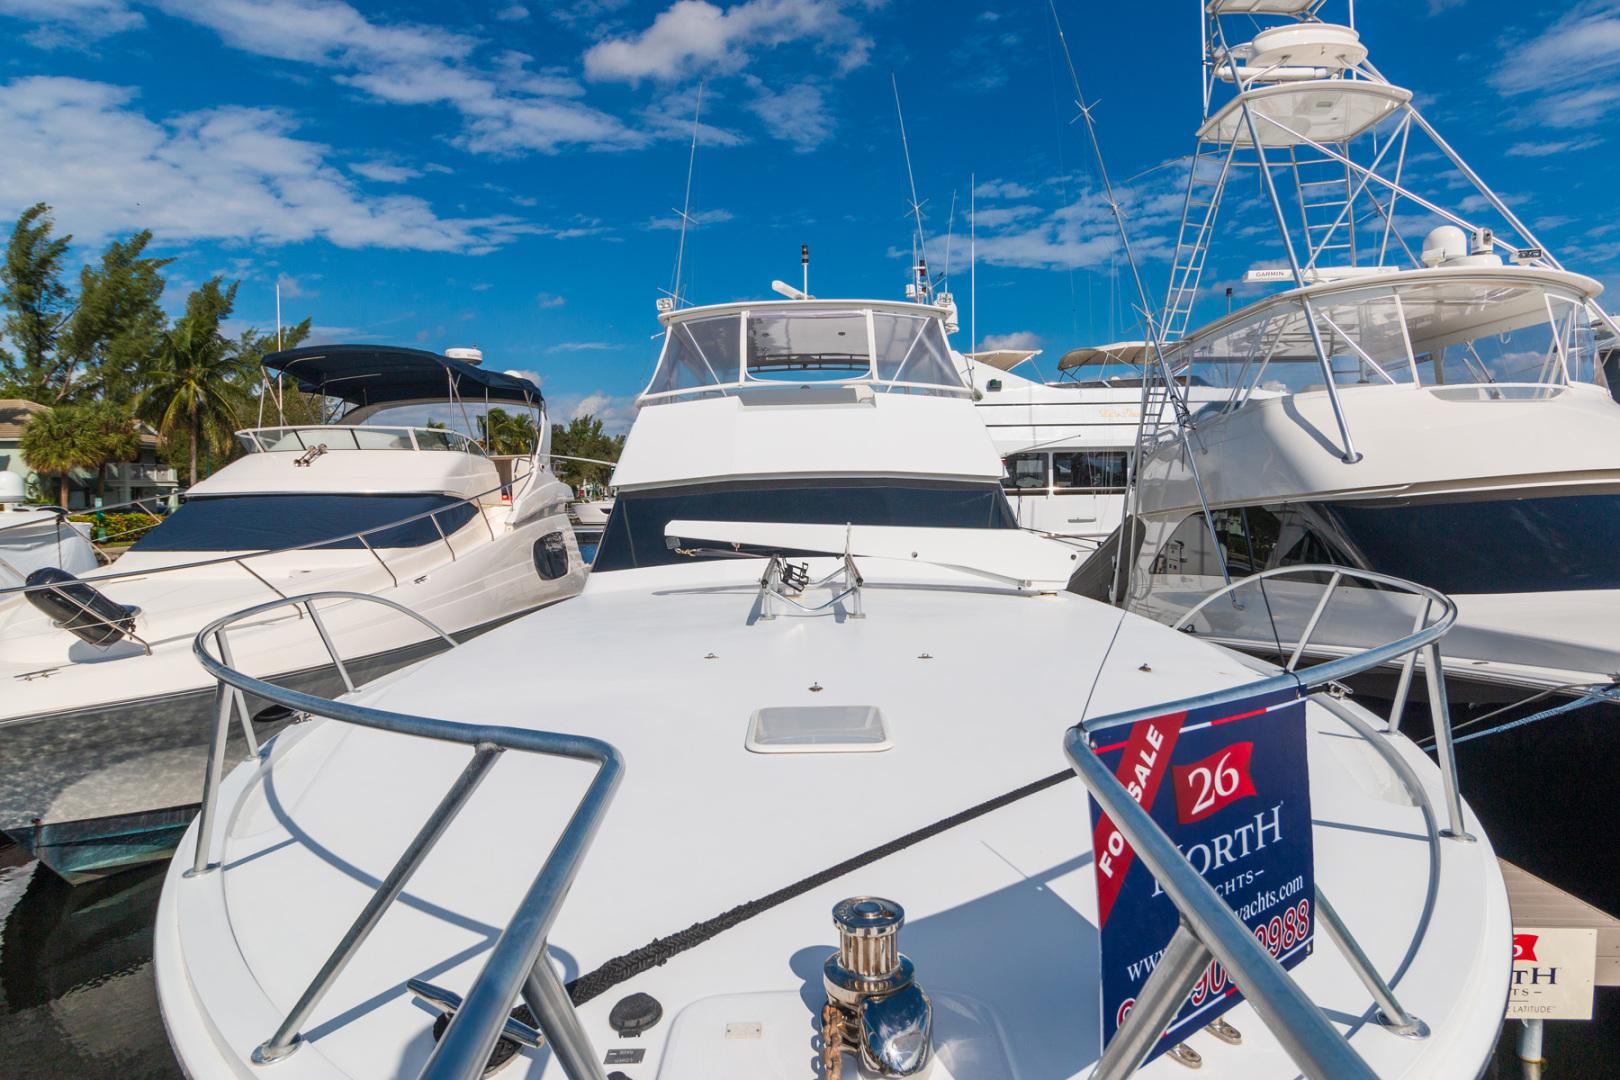 Viking-Convertible 2000-Knotty Girl Fort Lauderdale-Florida-United States-1564773   Thumbnail